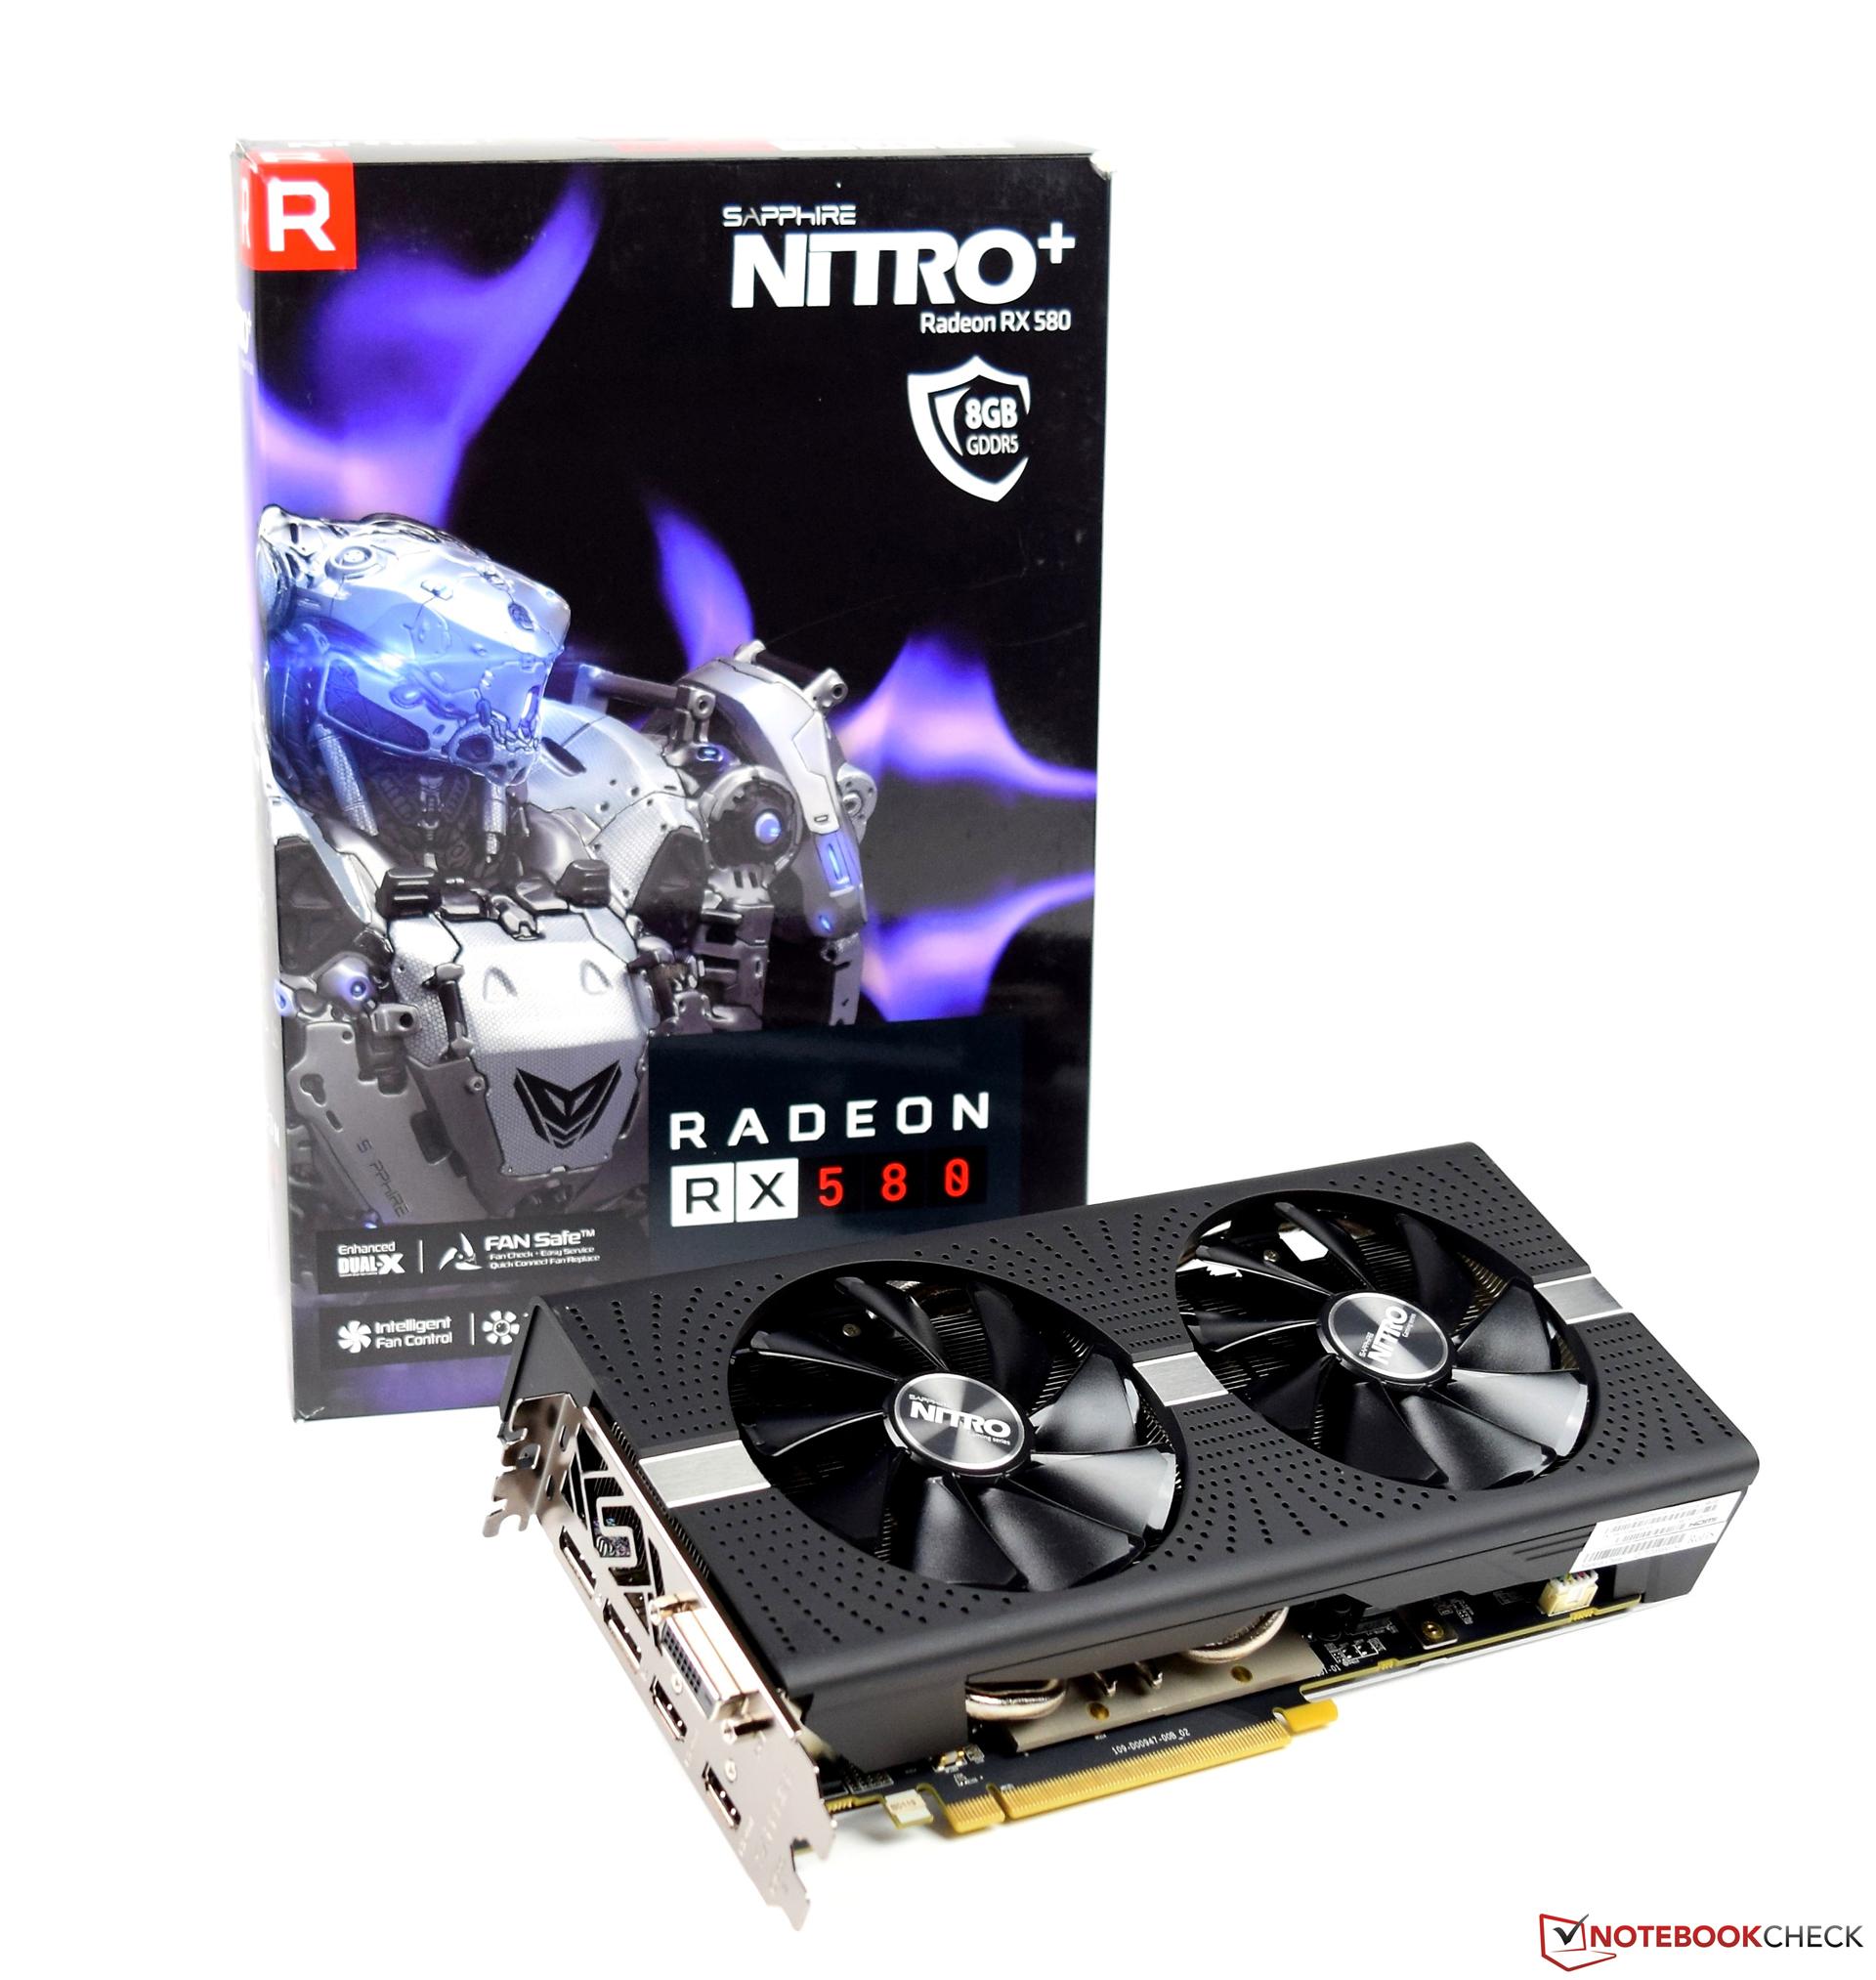 Sapphire Nitro+ Radeon RX 580 Desktop Graphics Card Review